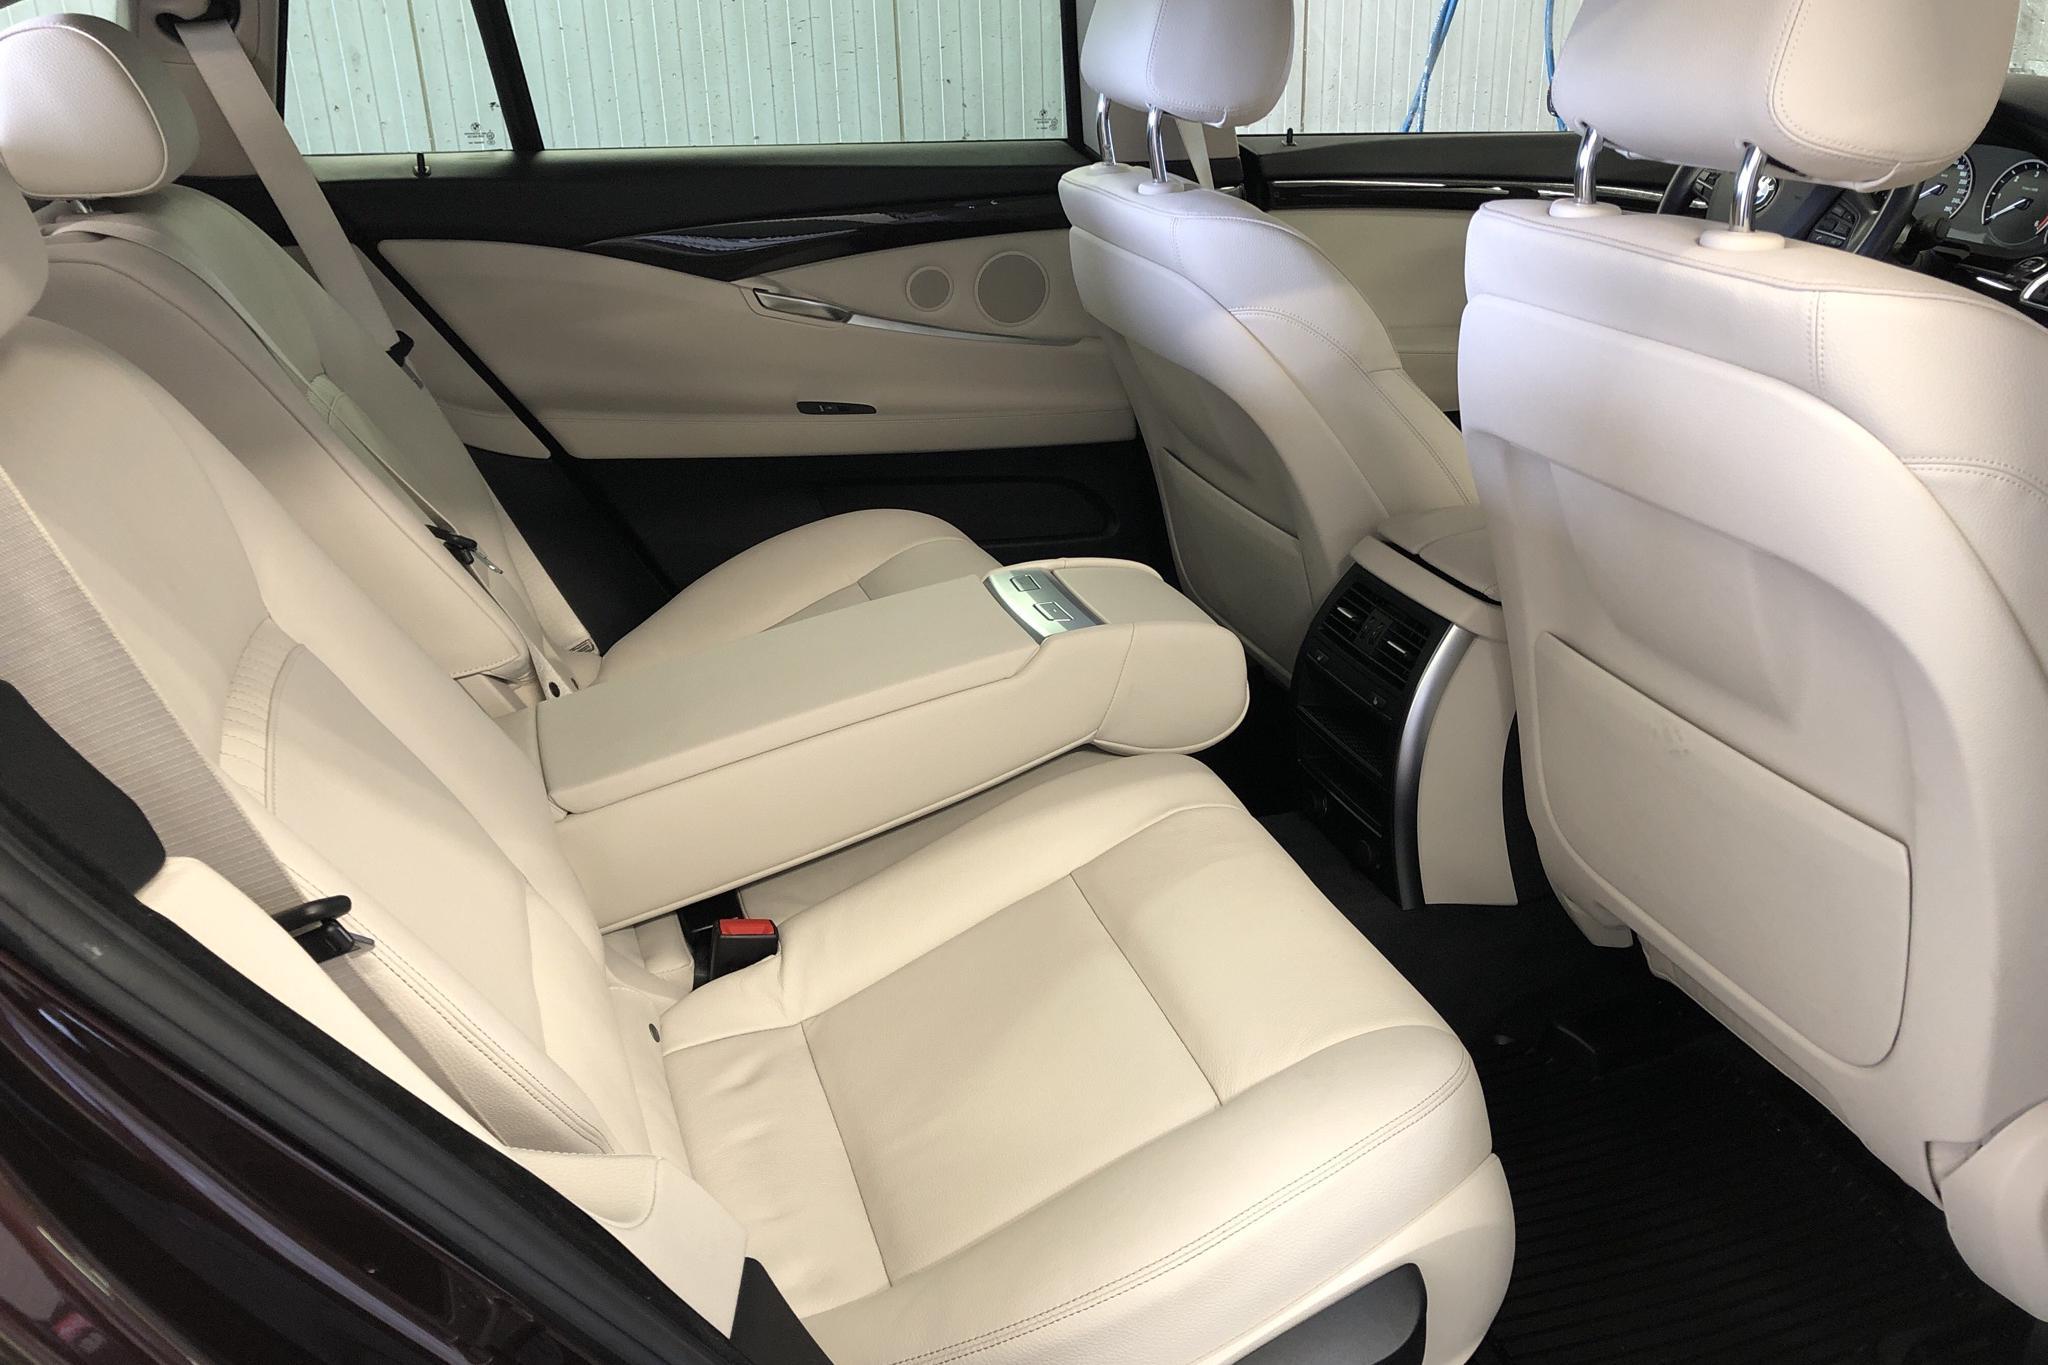 BMW 530d GT xDrive, F07 (258hk) - 7 065 mil - Automat - röd - 2015